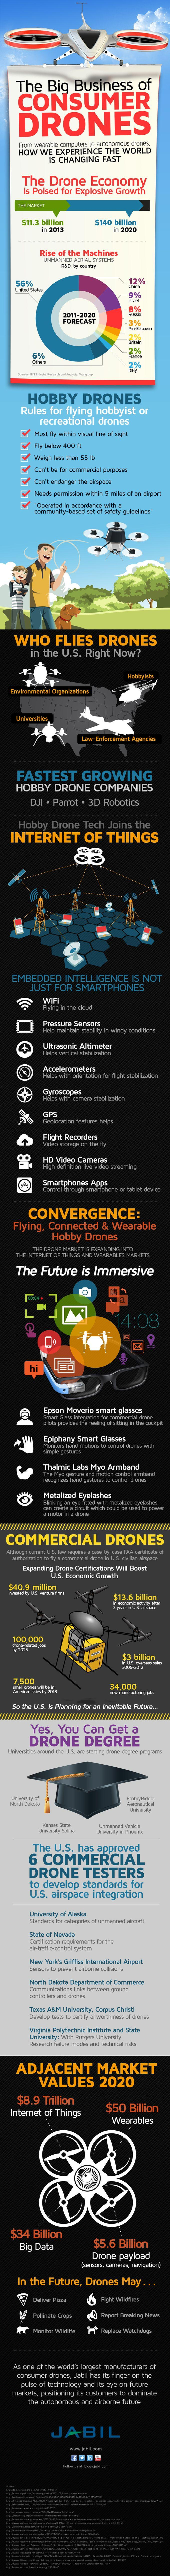 drones-consumers